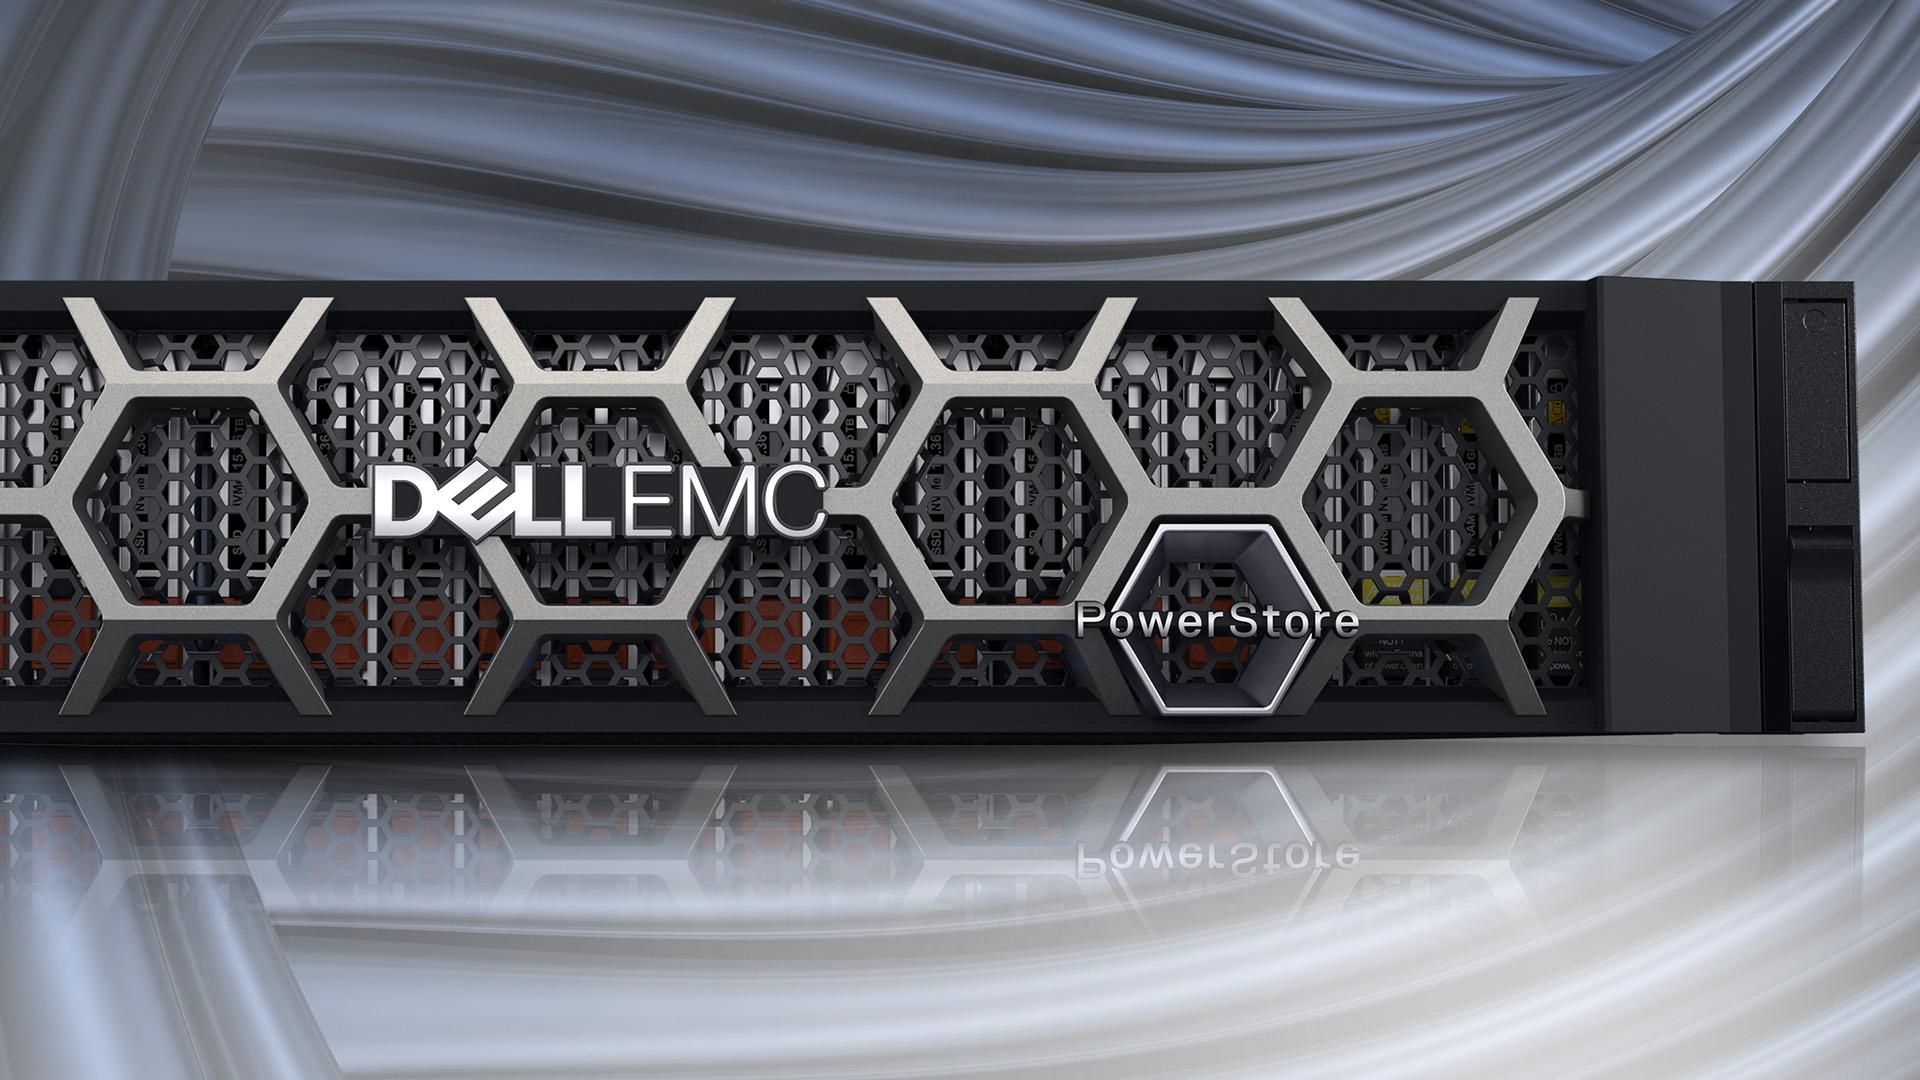 Dell EMC PowerStore коротко о нашей новейшей СХД корпоративного класса